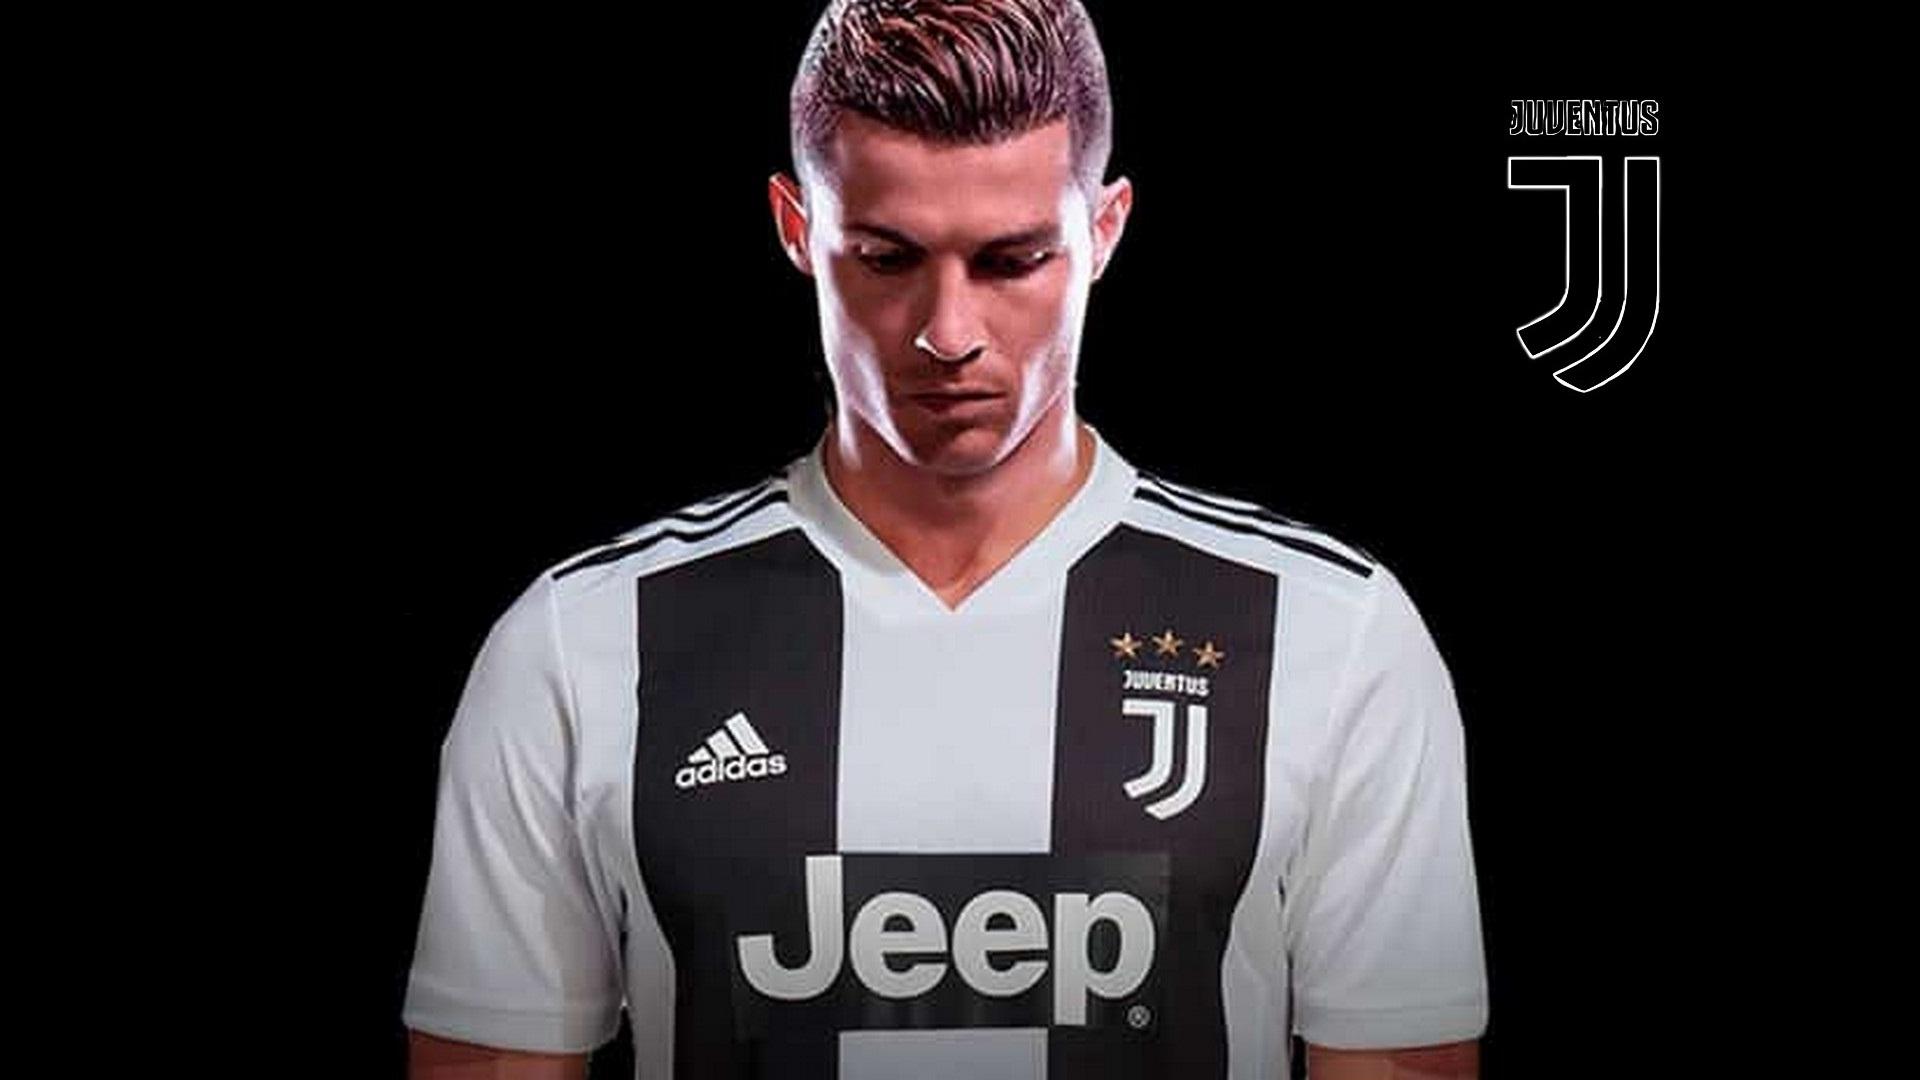 Hd Wallpapers Android Lock Screen Cr7 Juventus Wallpaper Hd 2018 Football Wallpapers